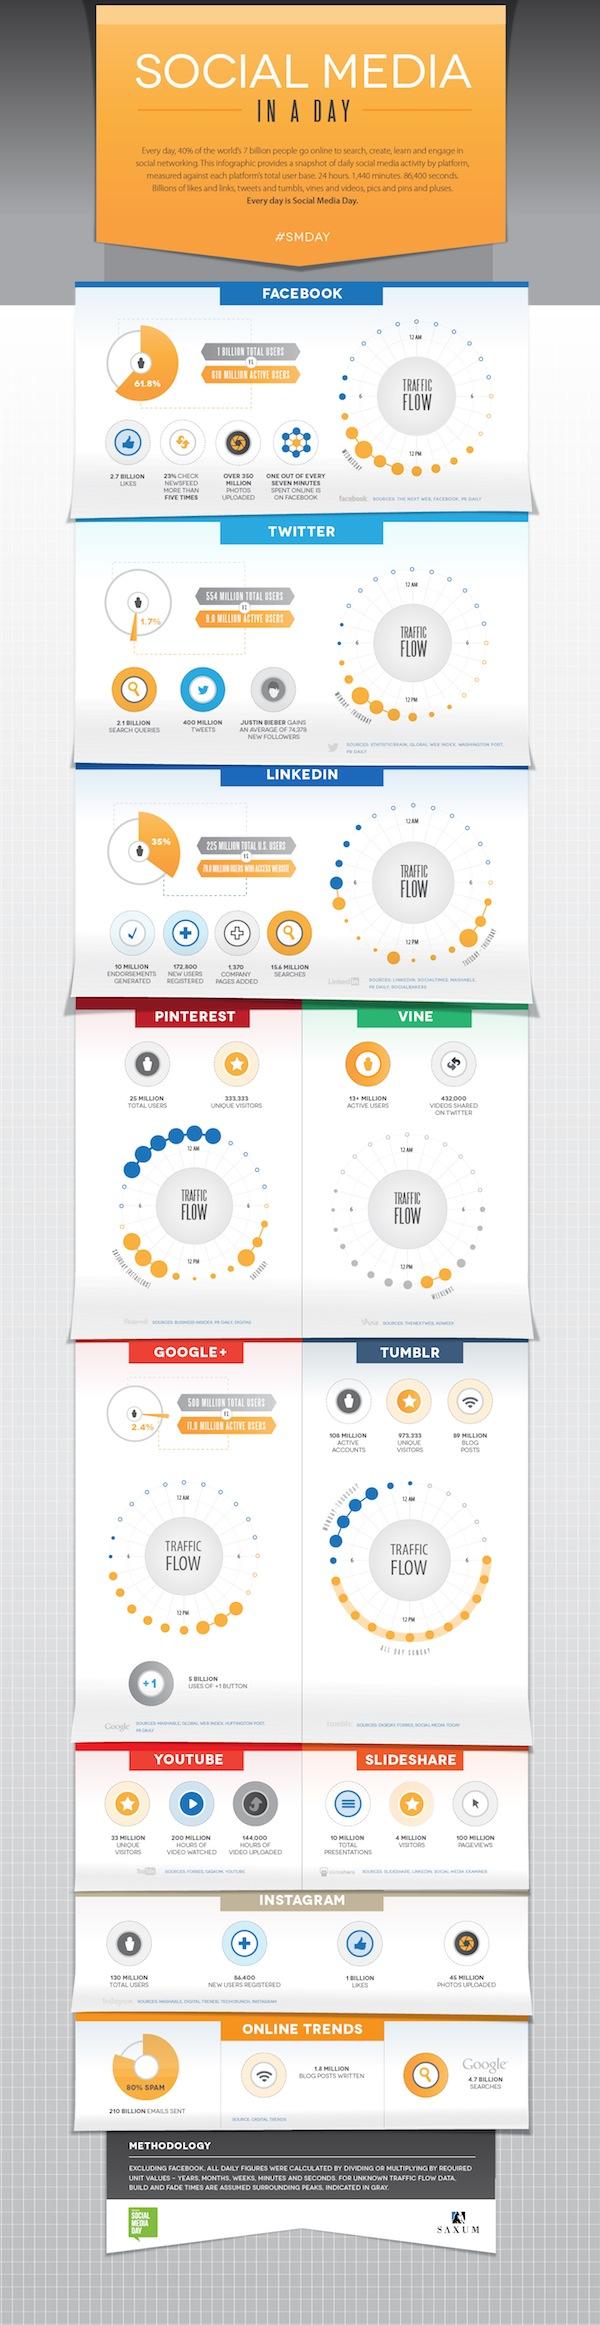 Saxum_SocialMediaDay_Infographic-Blog.jpeg